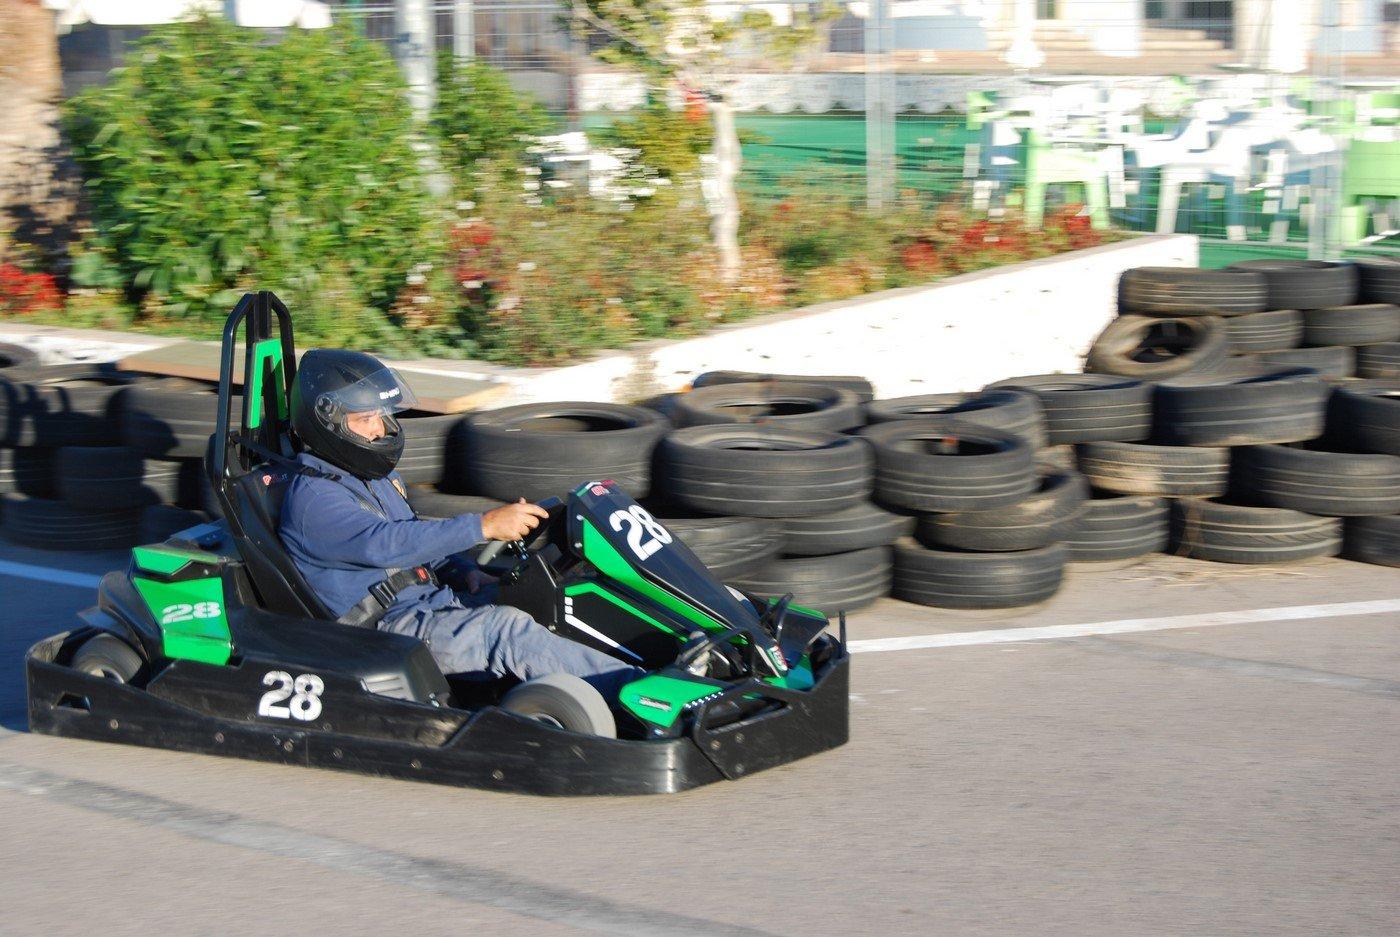 Circuito Wipeout Marina D Or : Circuito de karts marina dor